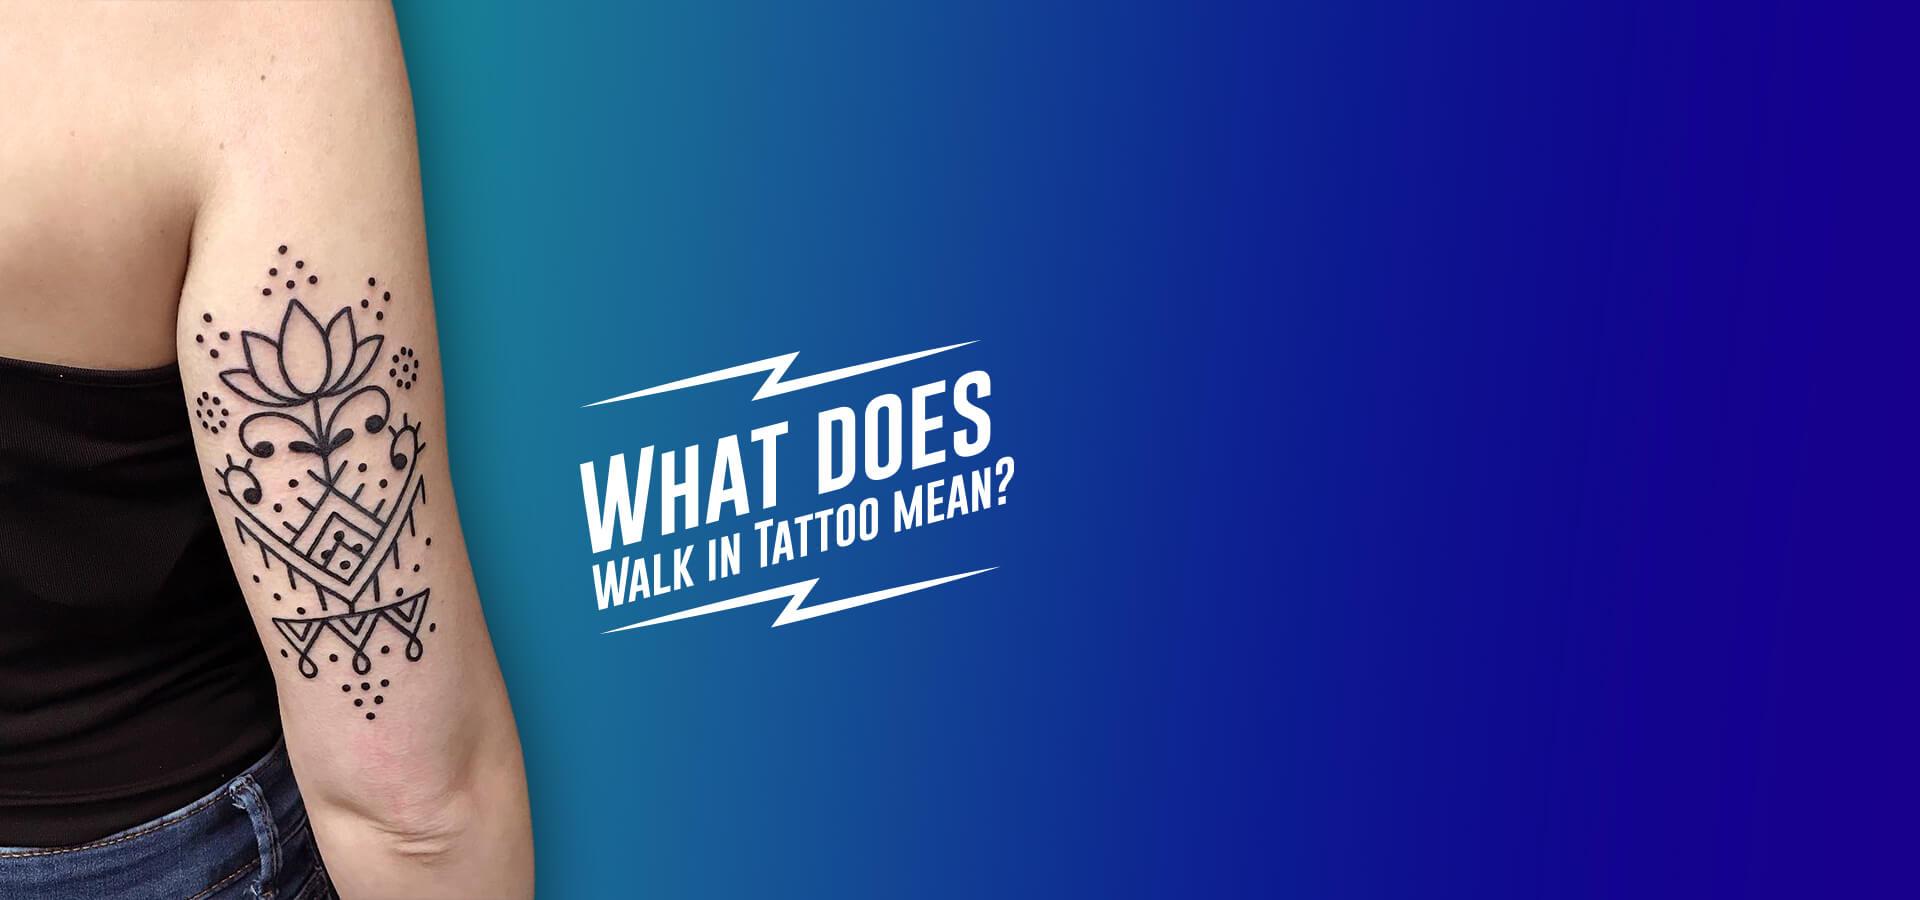 Walk in tattoo Barcelona